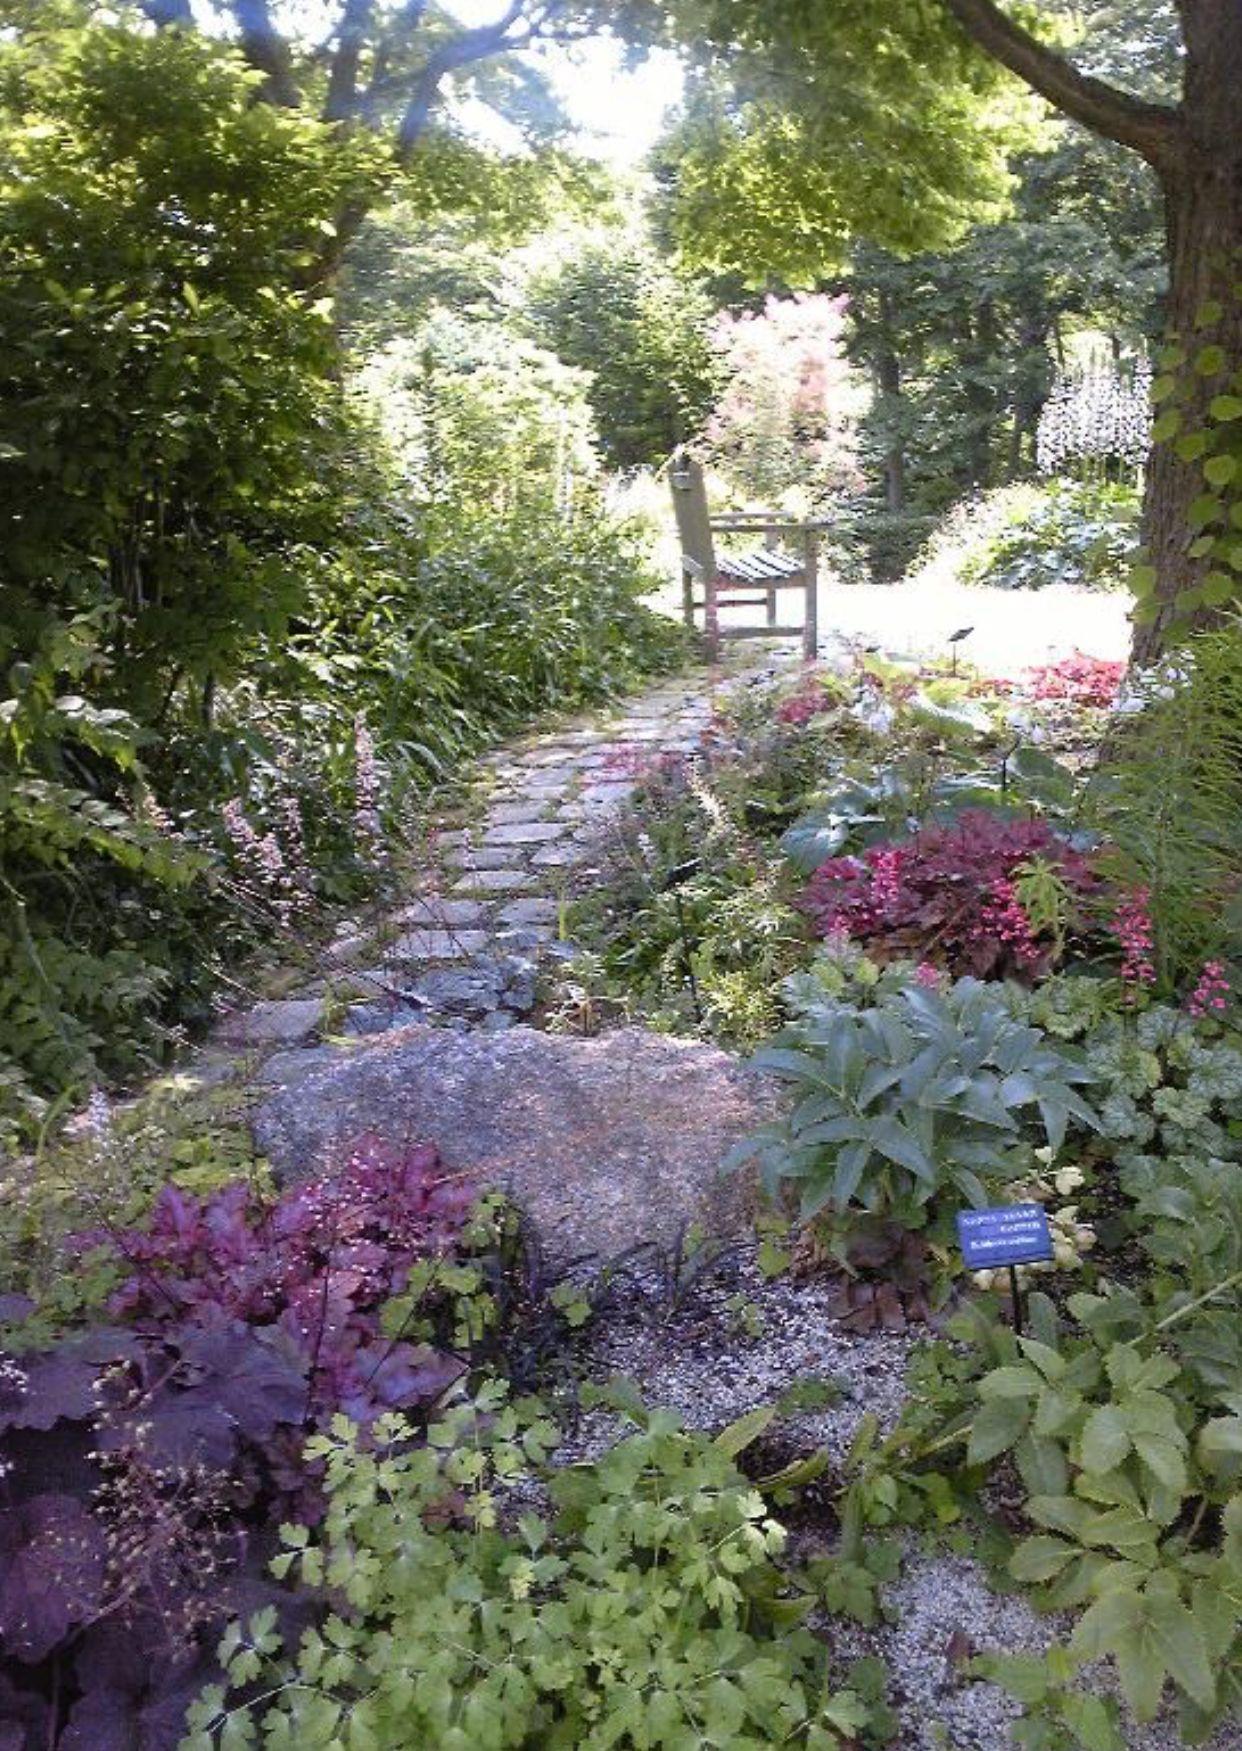 Pin By Divya On Landscaping Cottage Garden Backyard Garden Small Cottage Garden Ideas